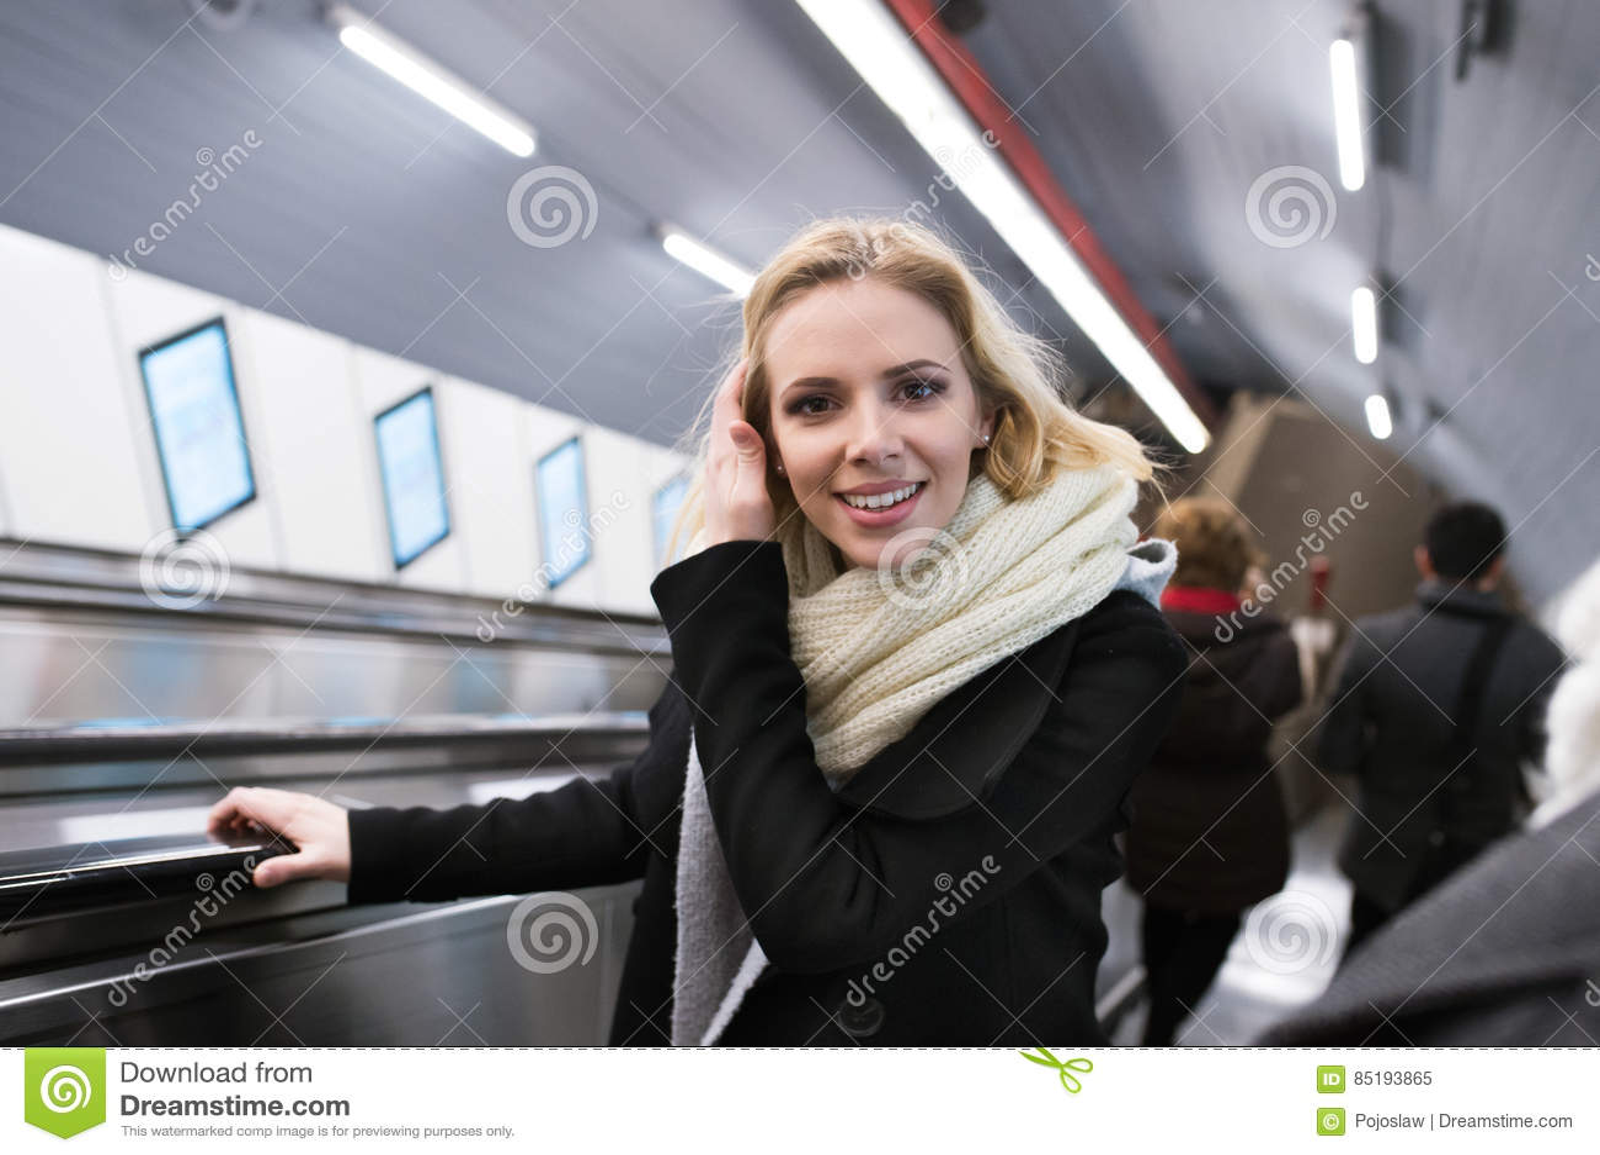 junge frau, die an der rolltreppe in wien-u-bahn steht